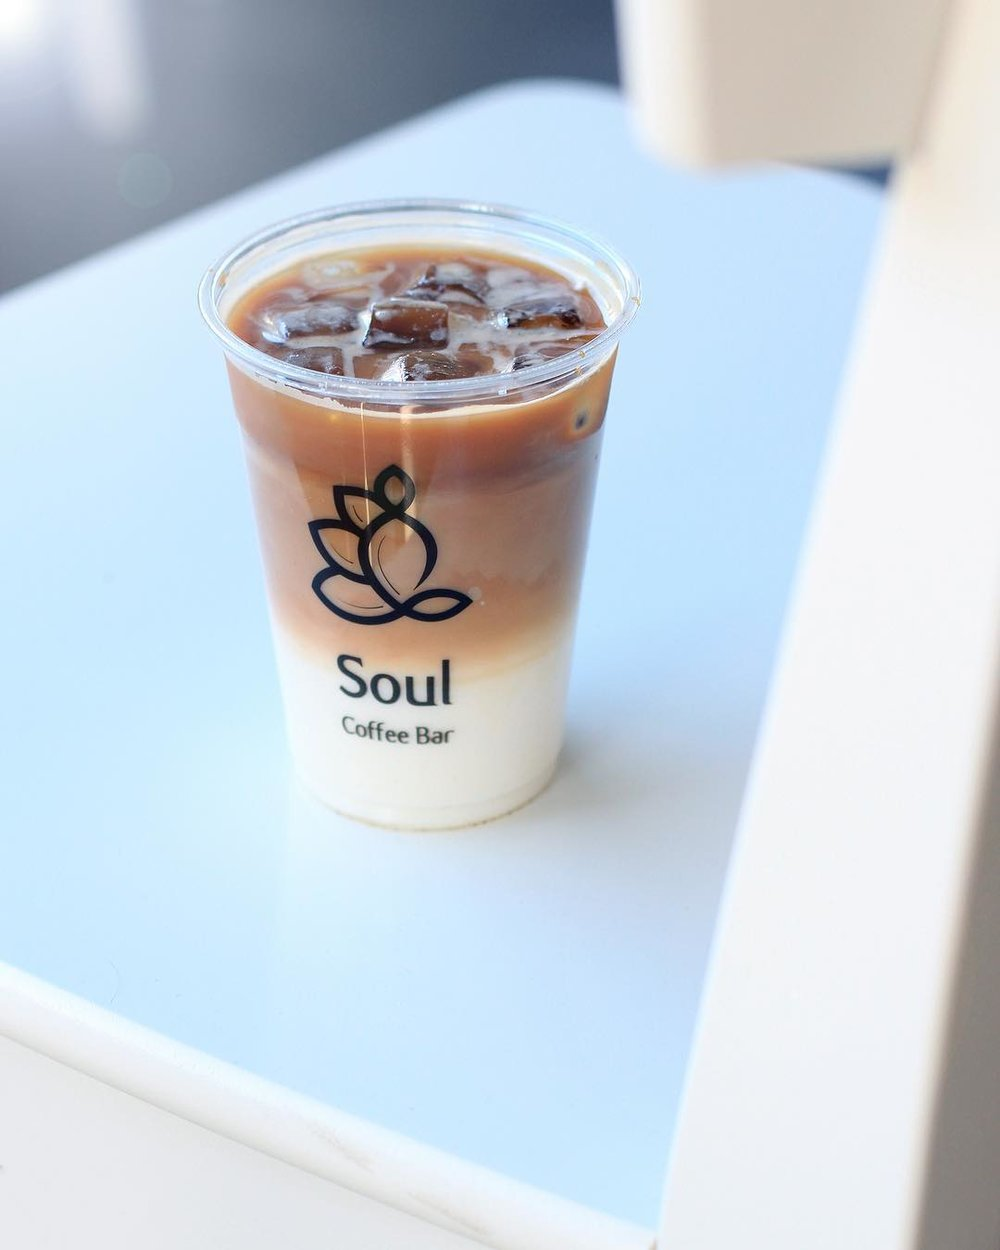 @soulcoffeebar